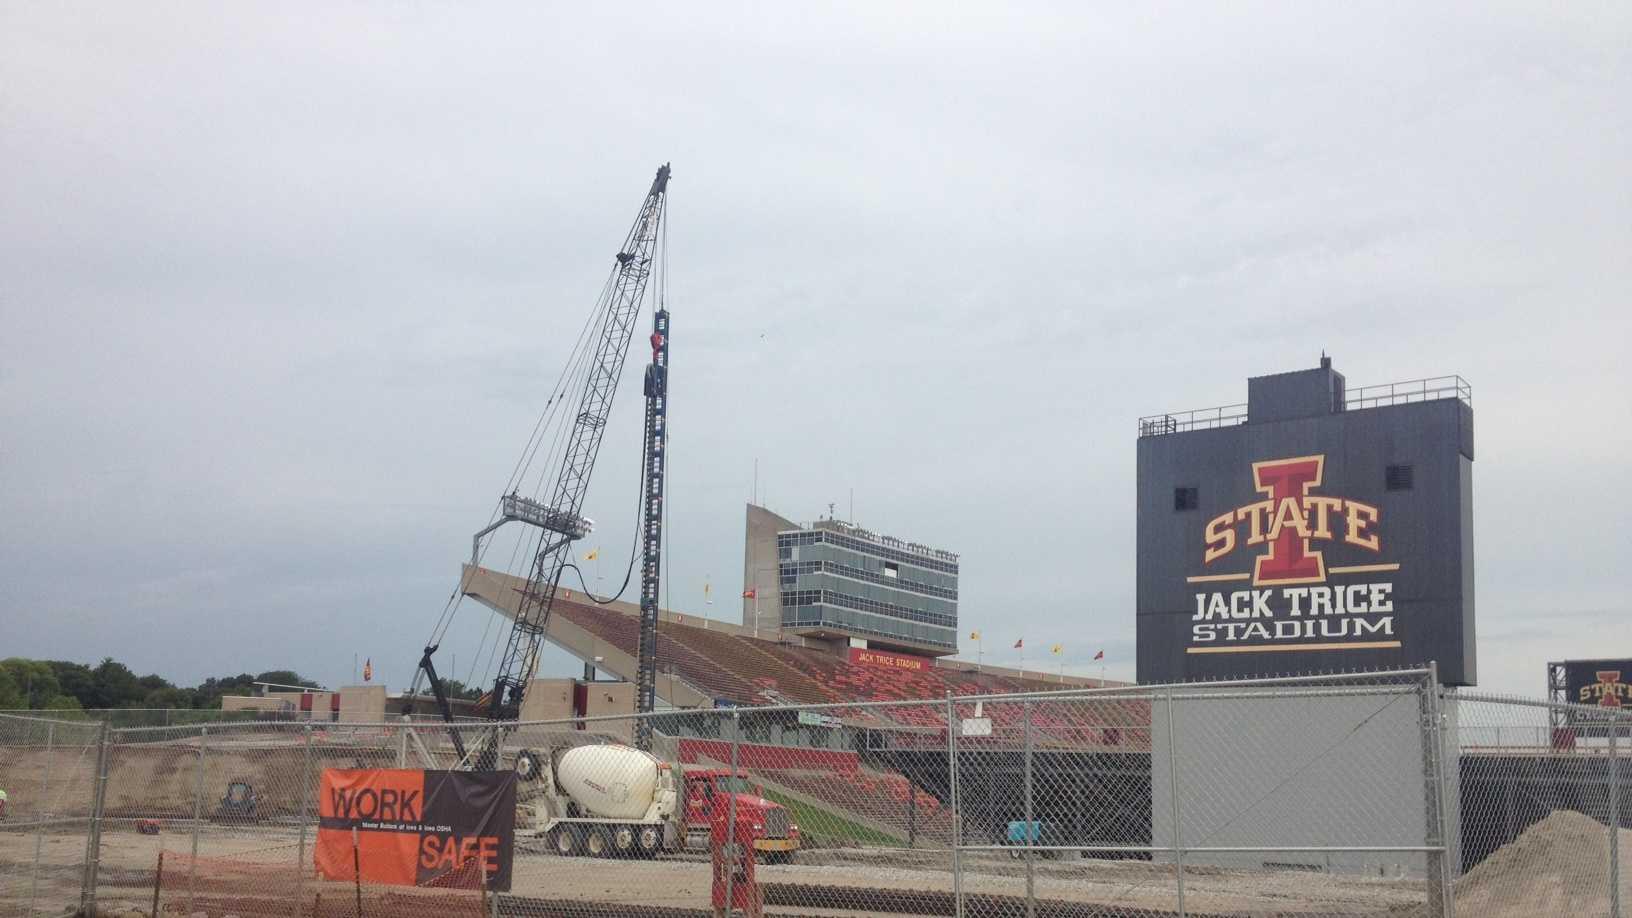 Construction at Jack Trice Stadium